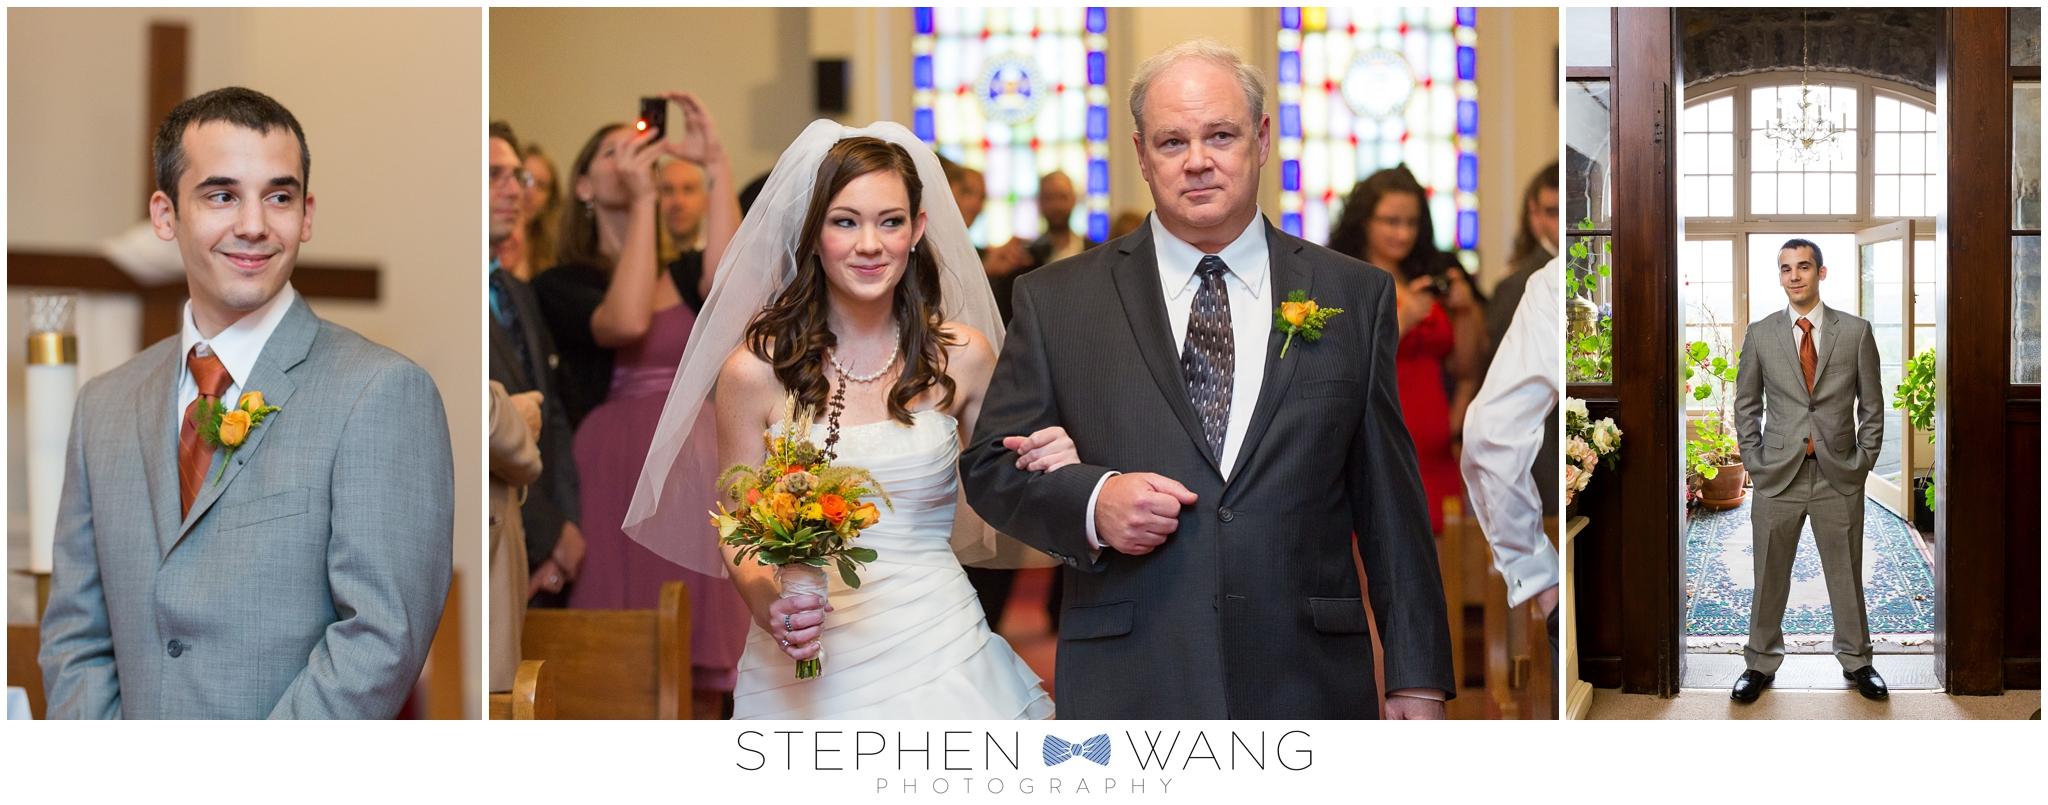 Stephen Wang Photography wedding connecticut deep river lace factory wedding photography connecticut photographer-01-22_0007.jpg